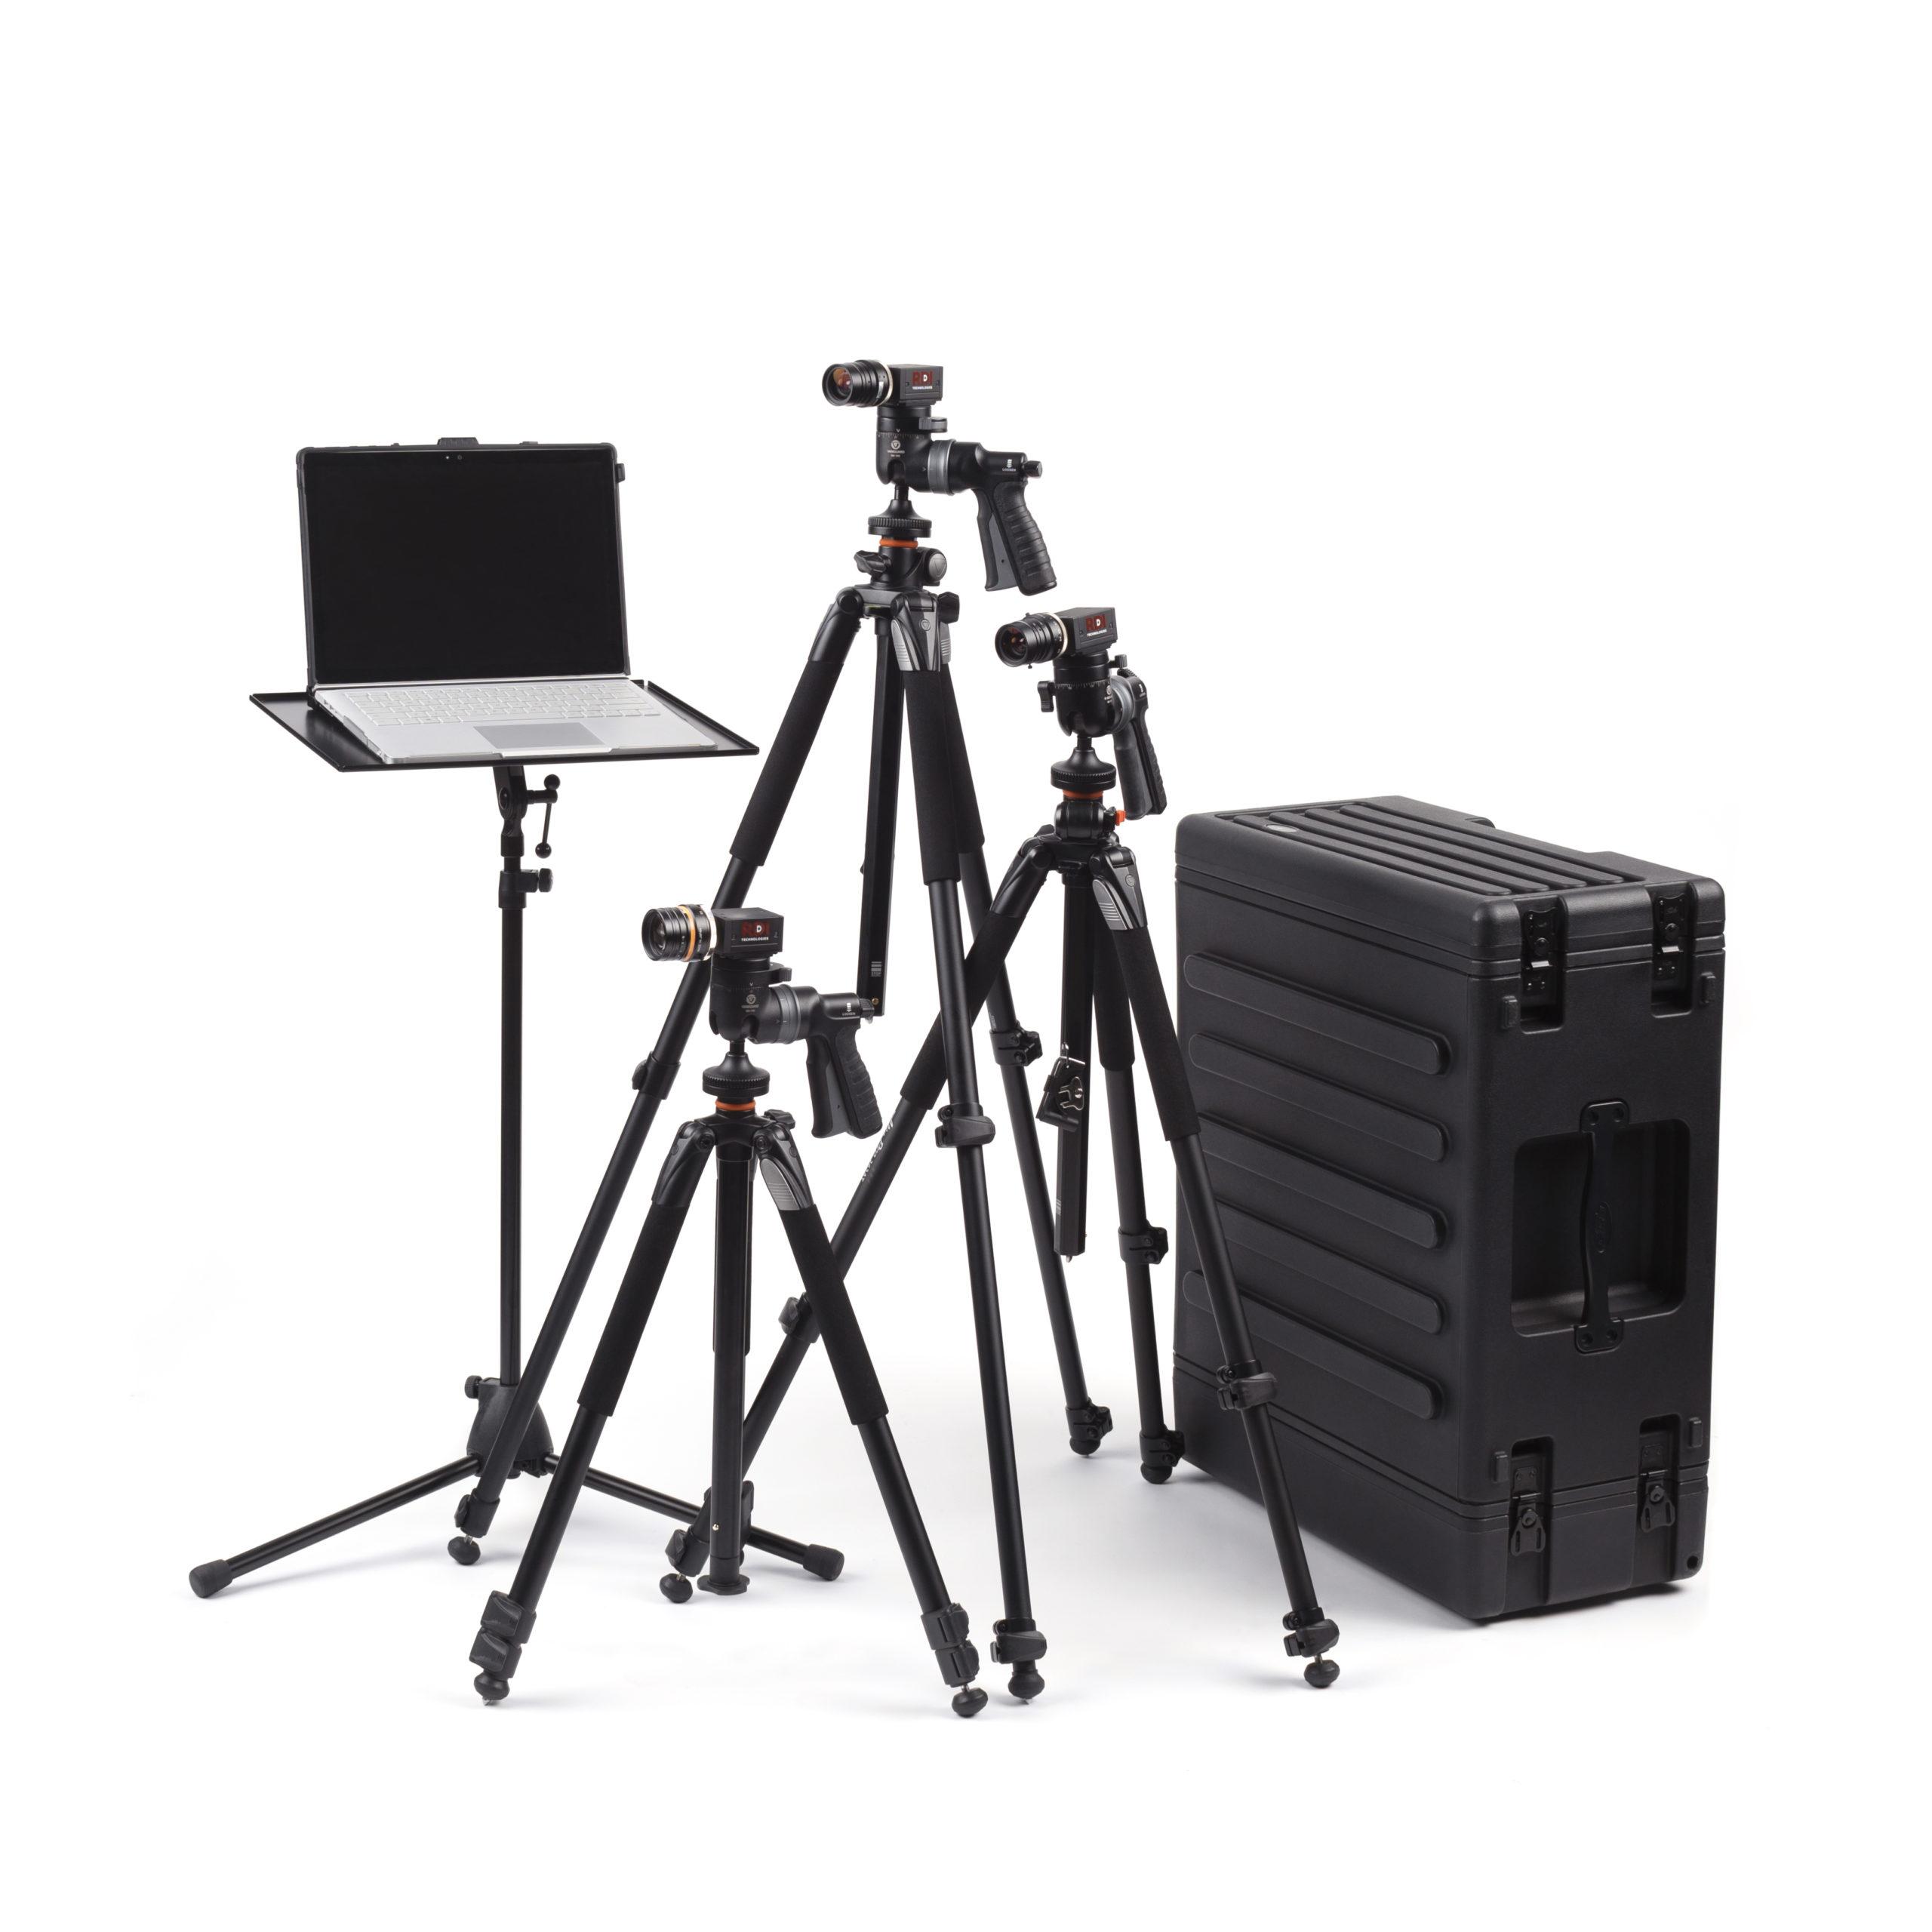 Iris CM cameras, pelican cases, laptop, and laptop stand